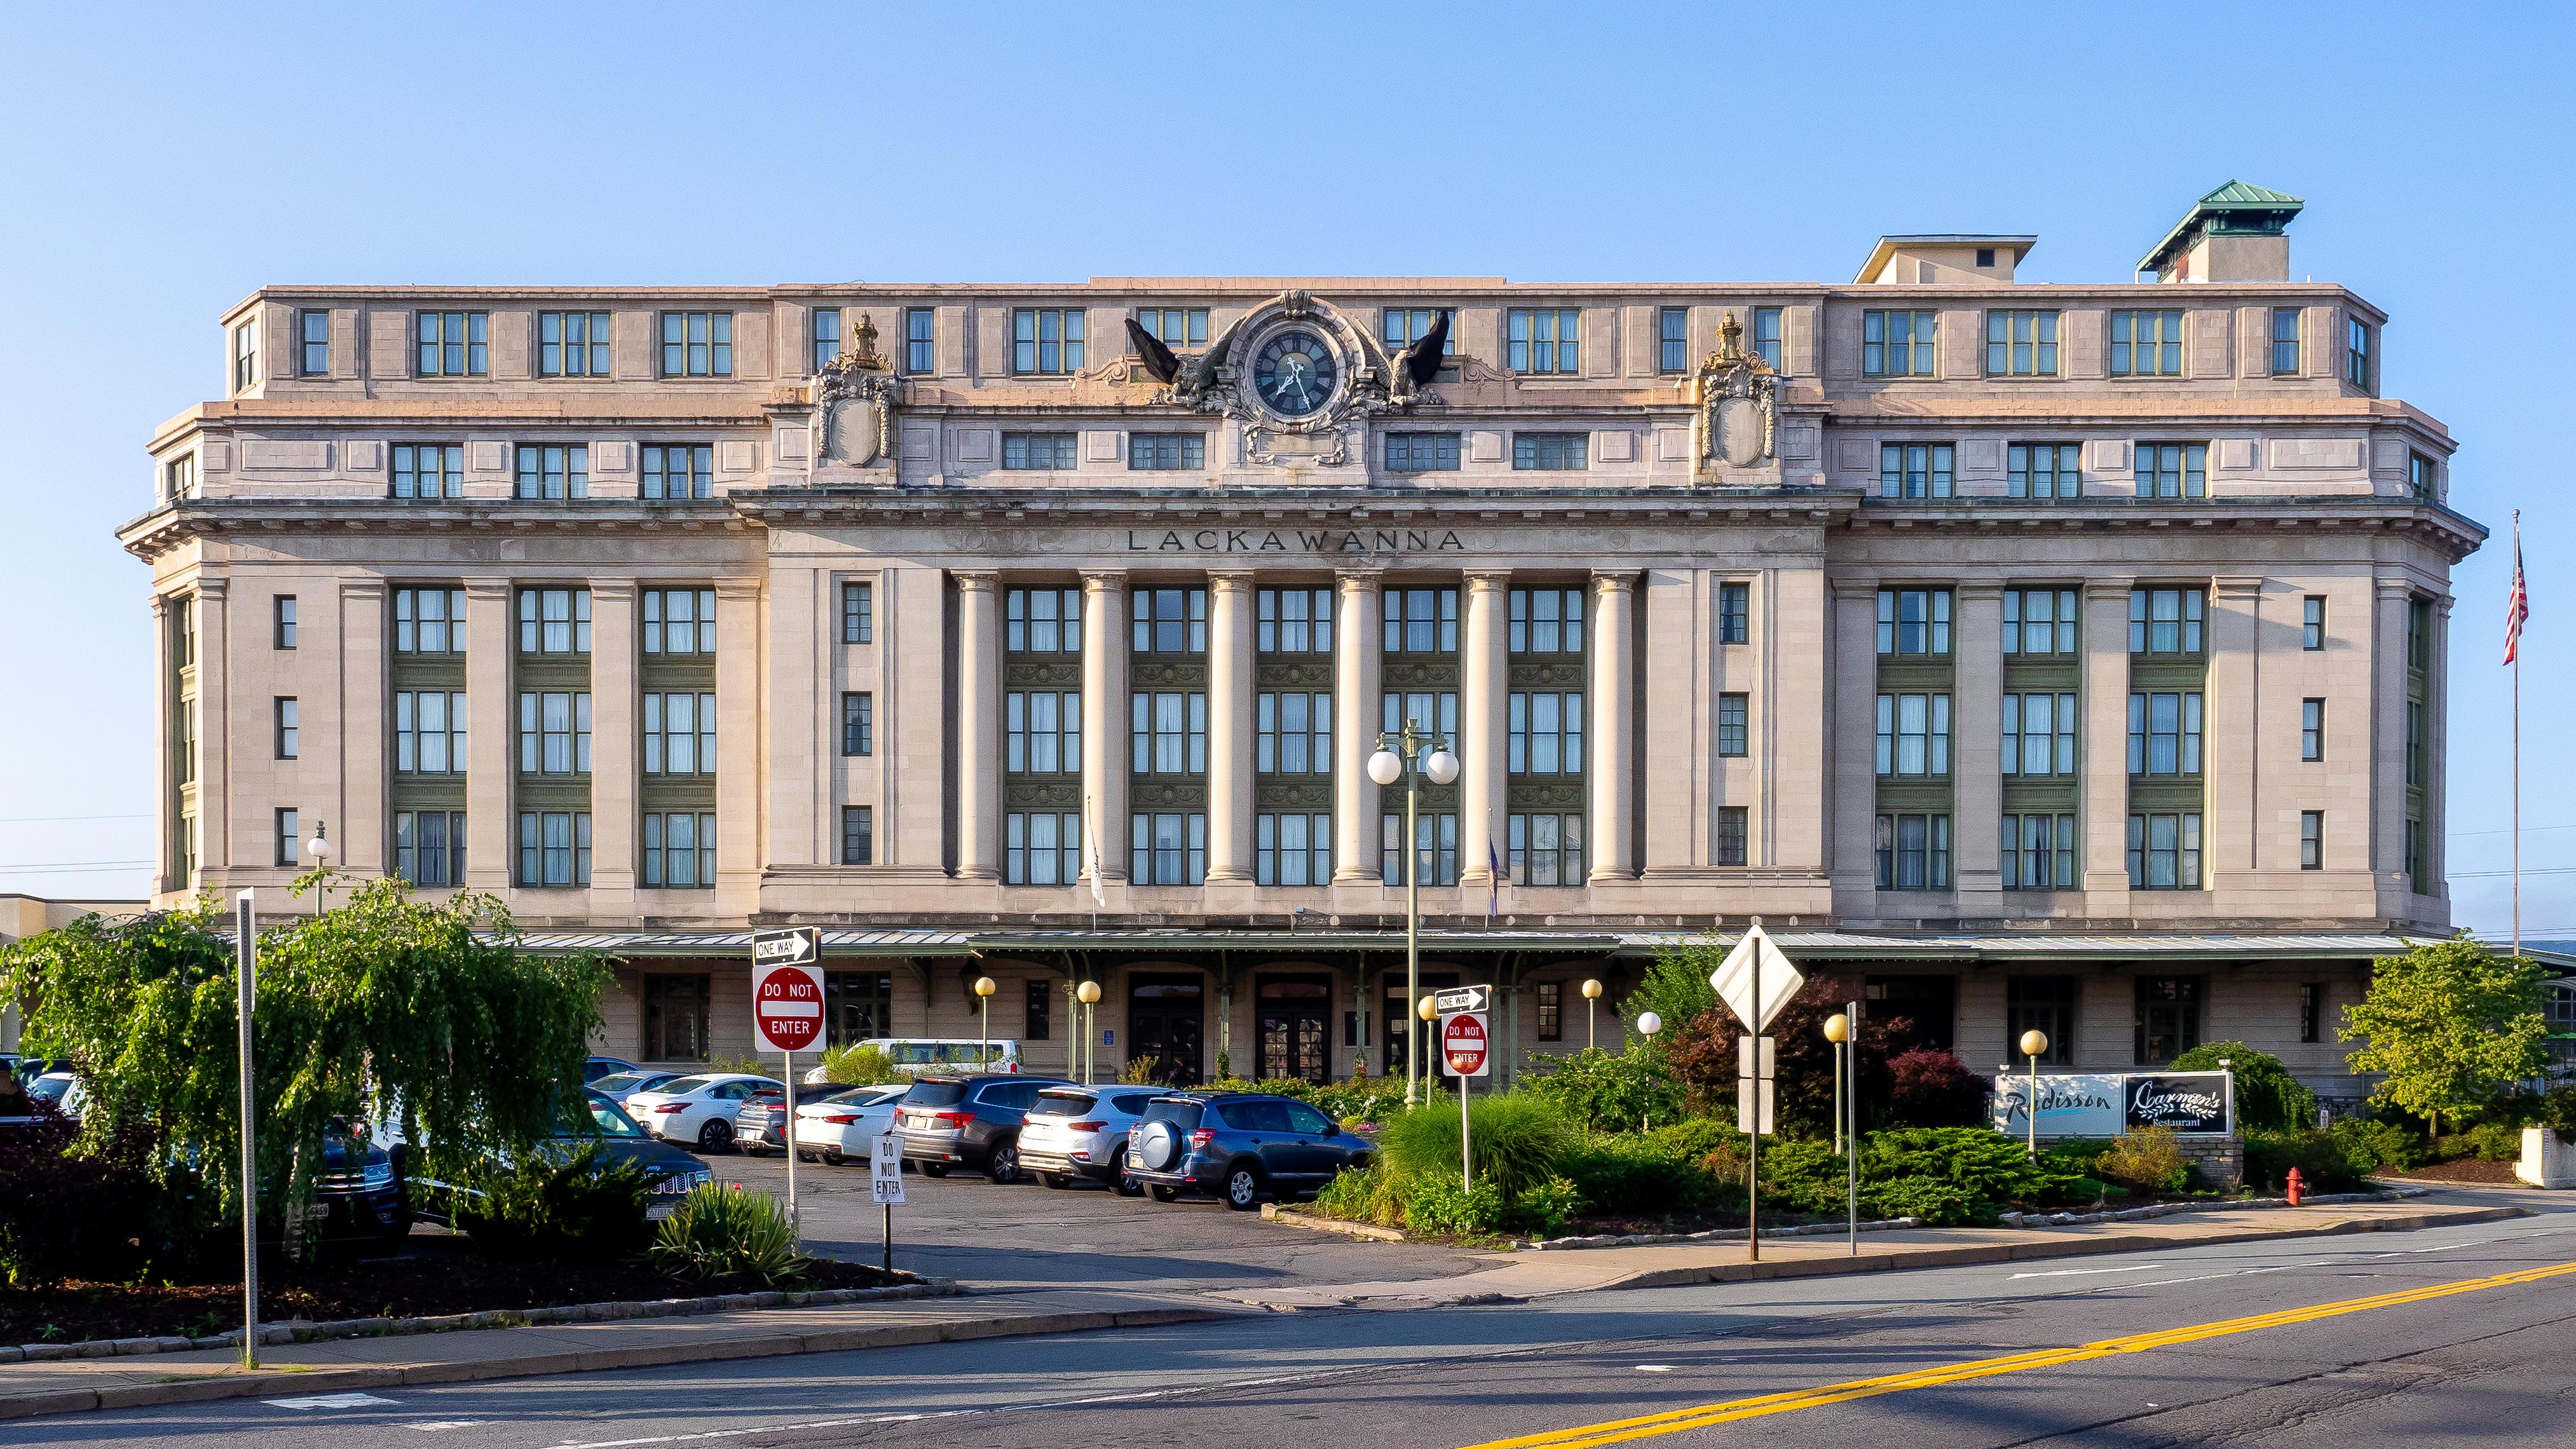 Radisson Lackawanna Station Hotel - Wikipedia